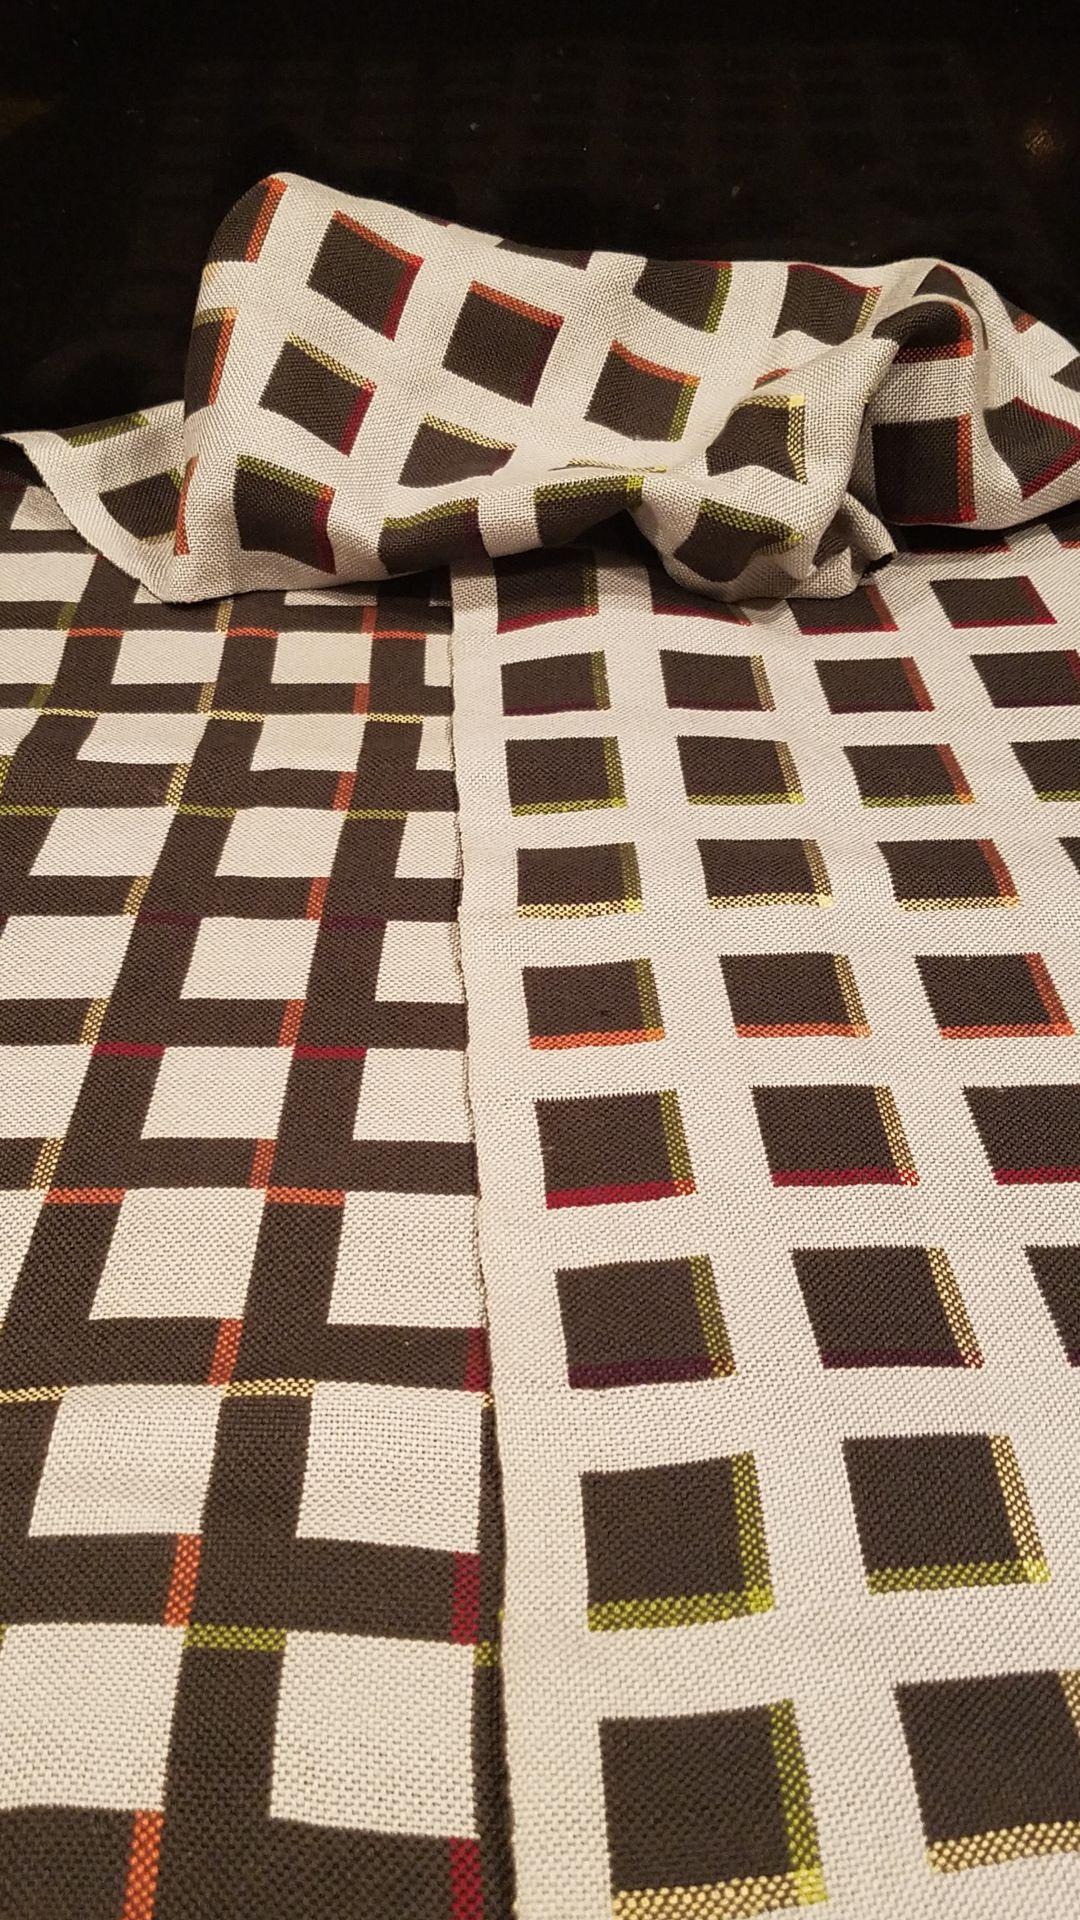 SherryCrum-Double Weave Scarf.jpg